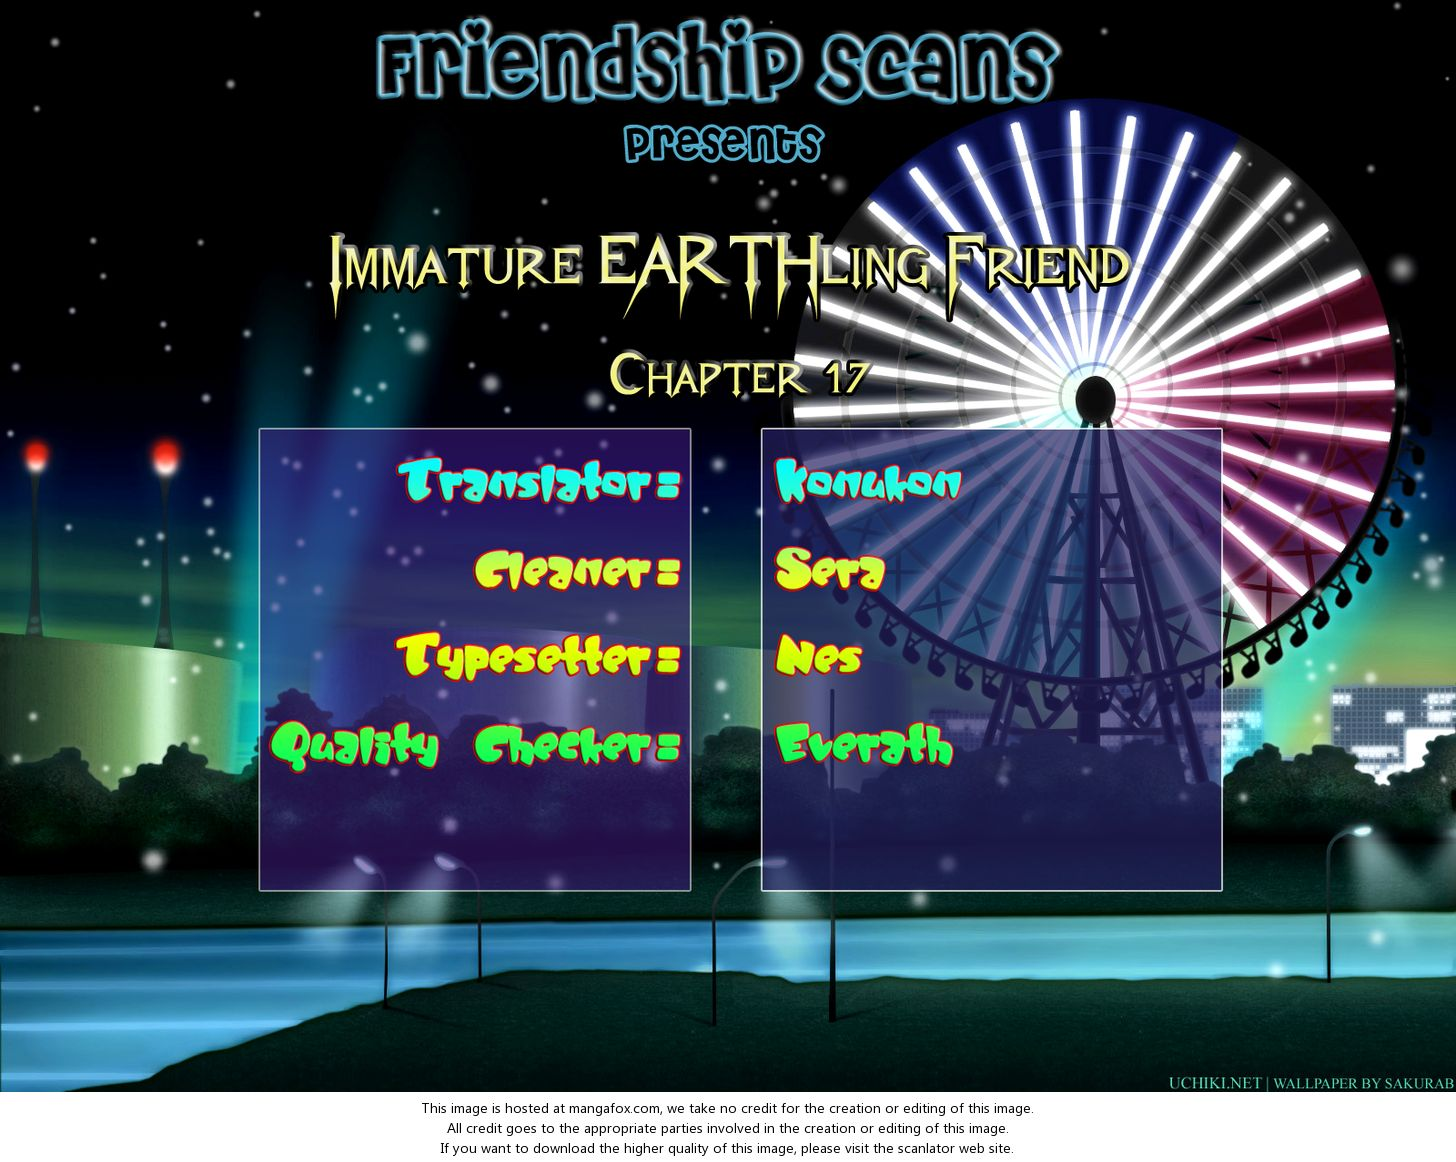 Immature EARTHling Friend 17: Mini Series: Love 100 Tons at MangaFox.la